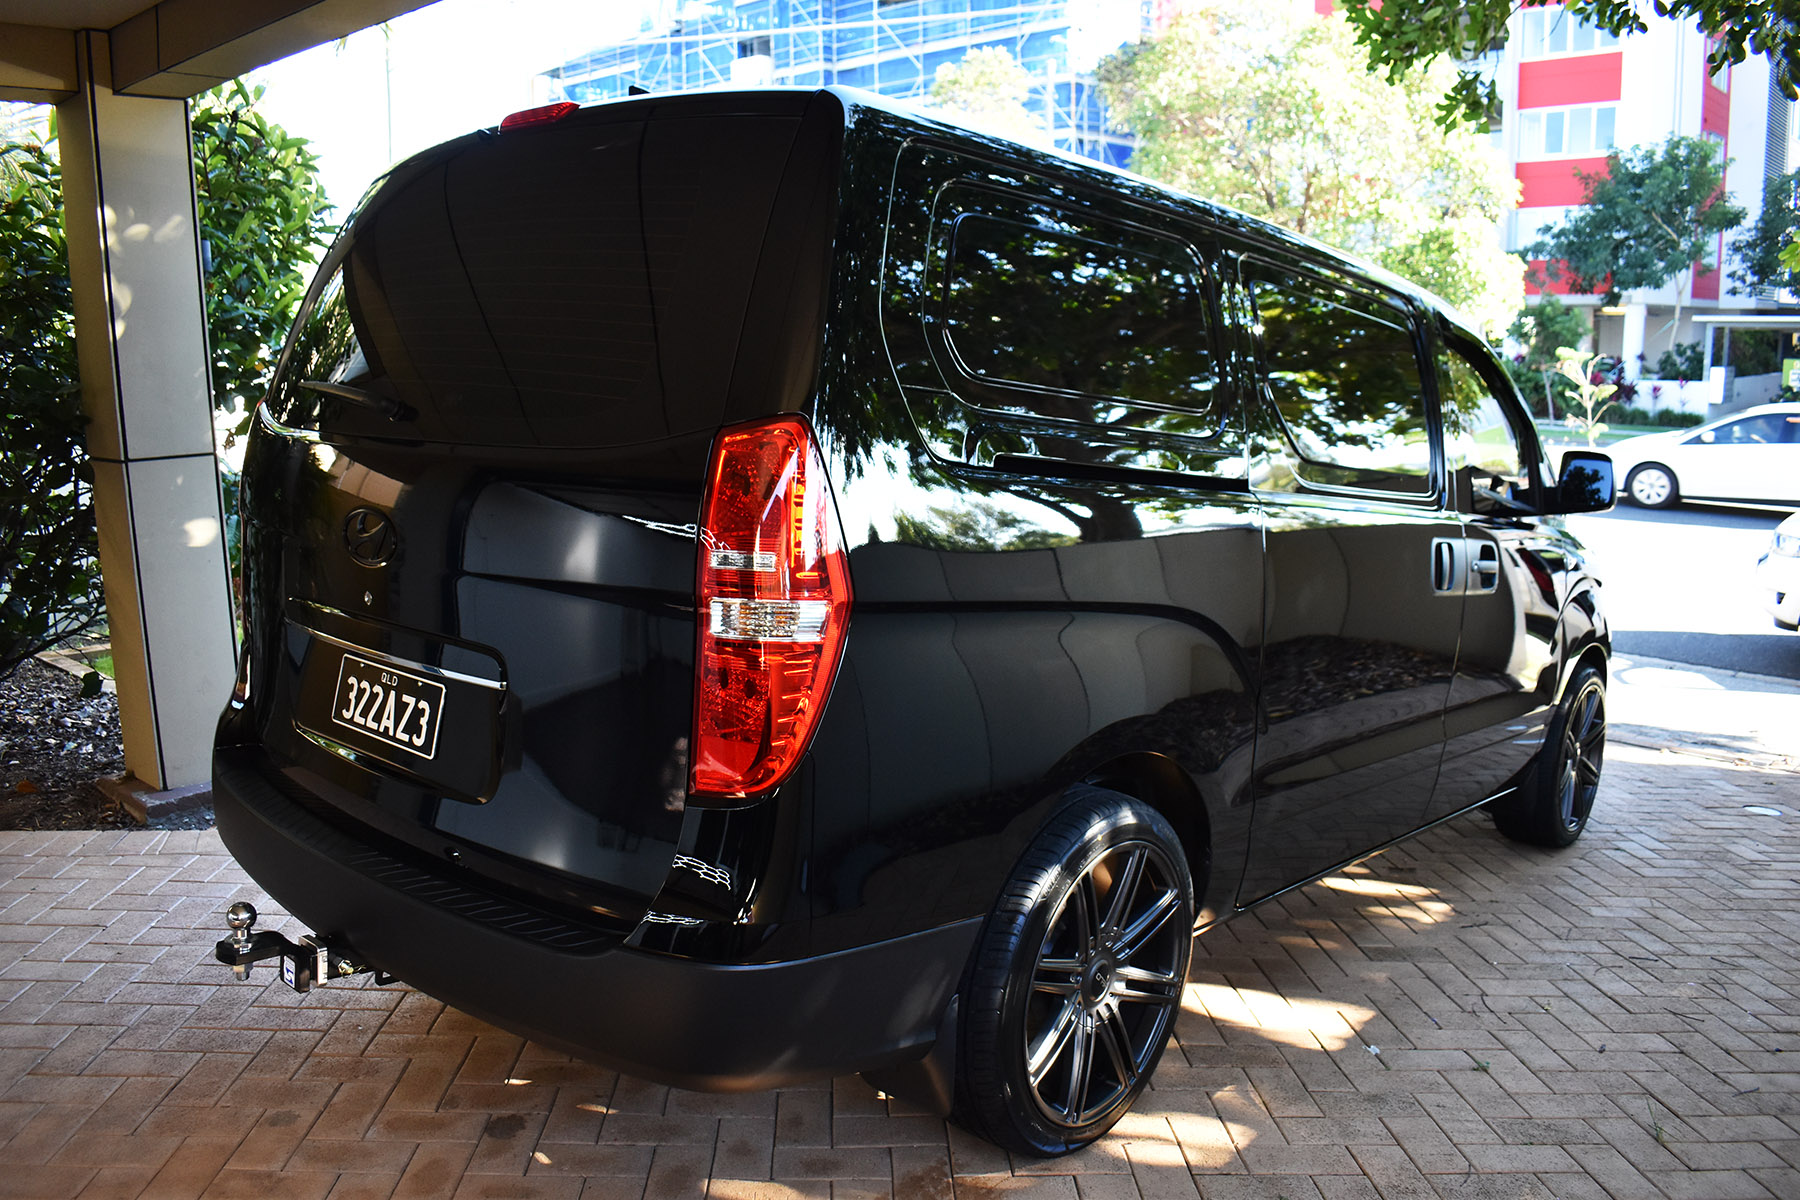 Hyundai iLoad New Vehicle Paint Protection Brisbane Near me 6